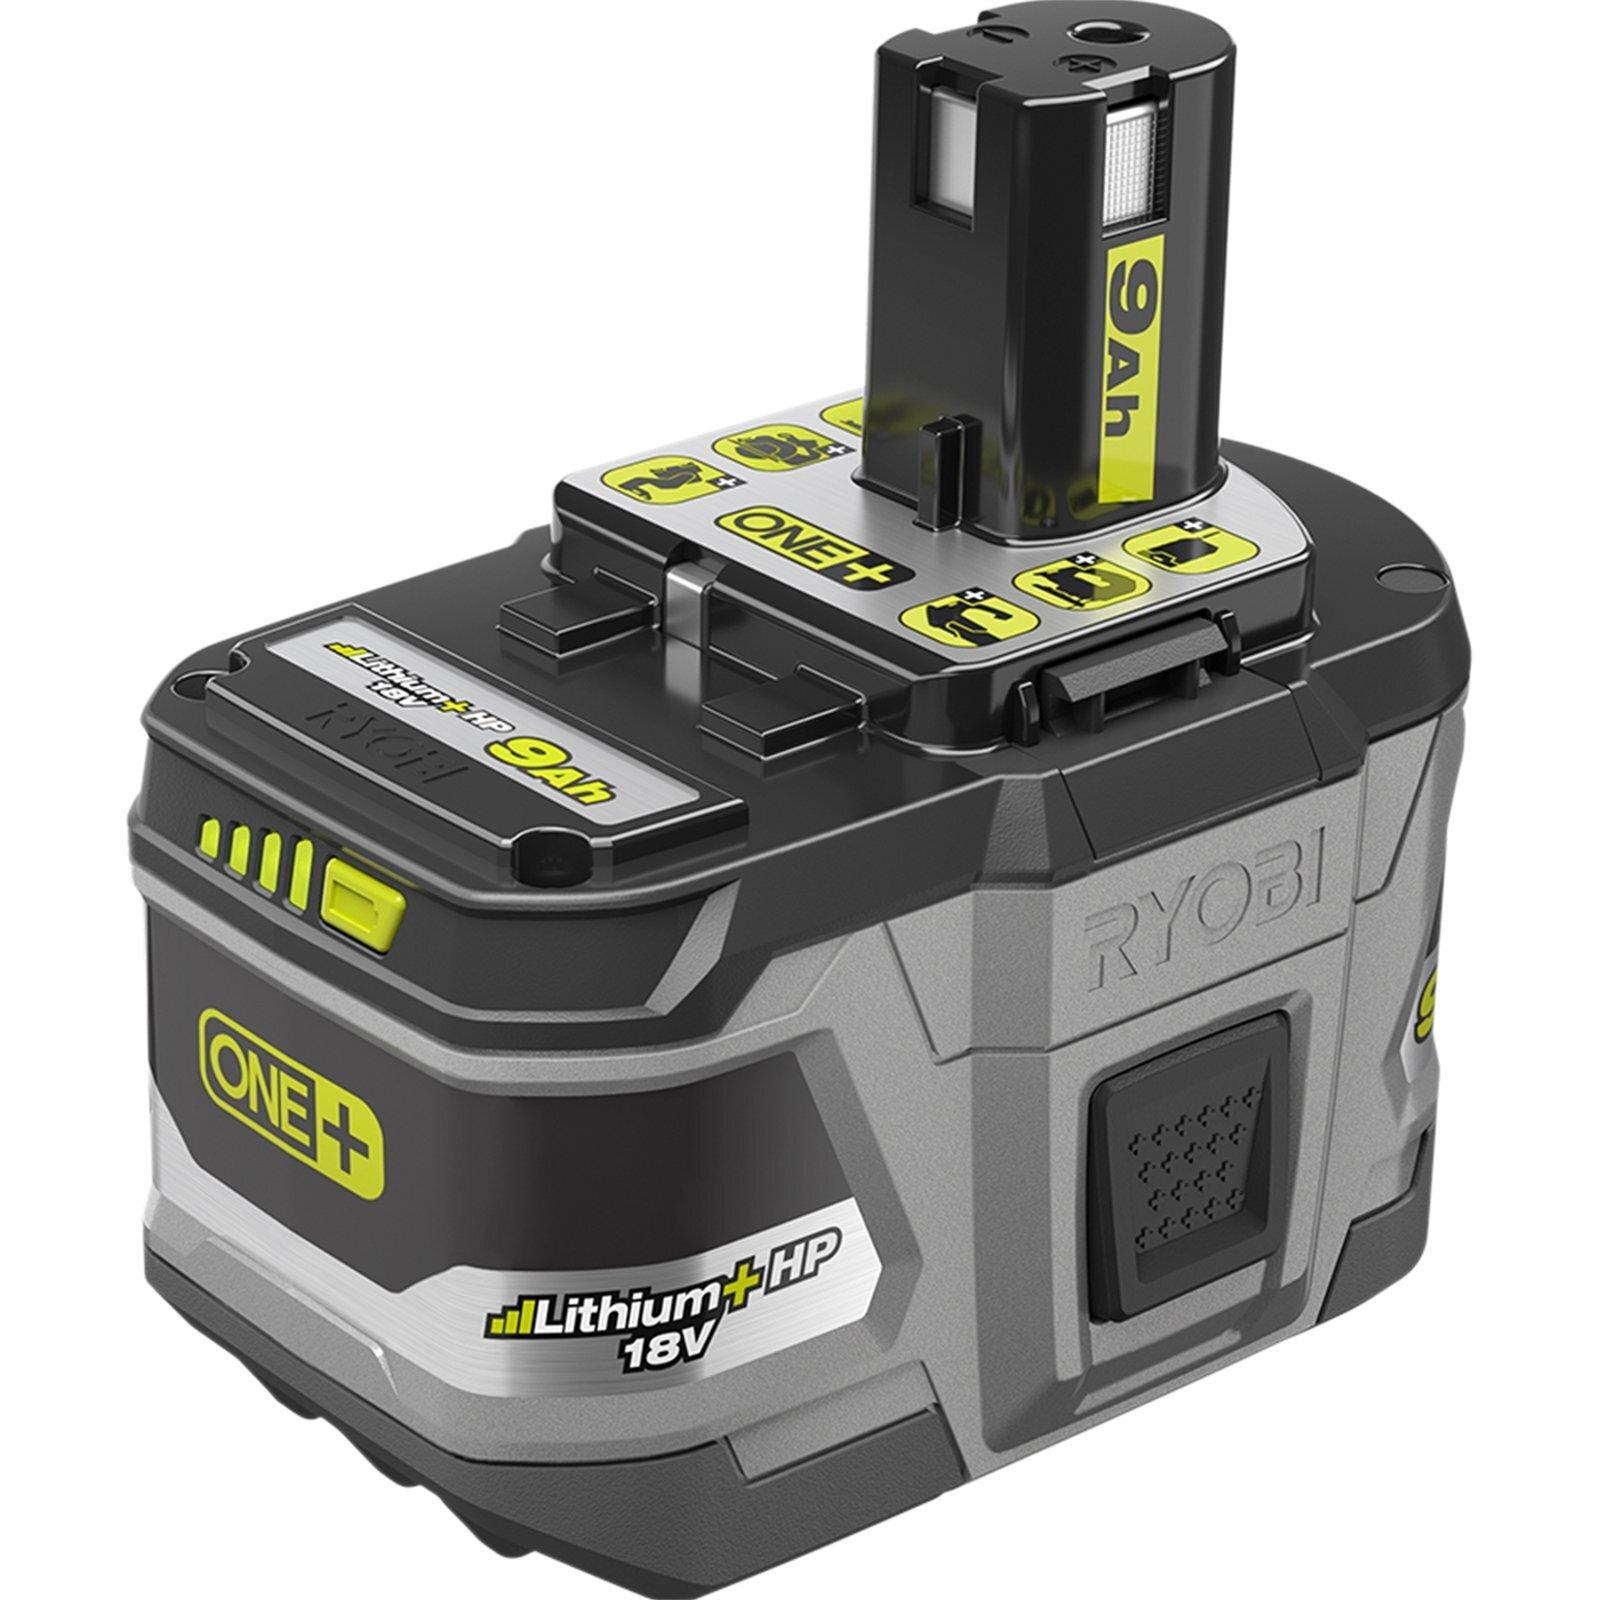 Ryobi 18V ONE+ 9.0Ah Lithium+ HP Battery